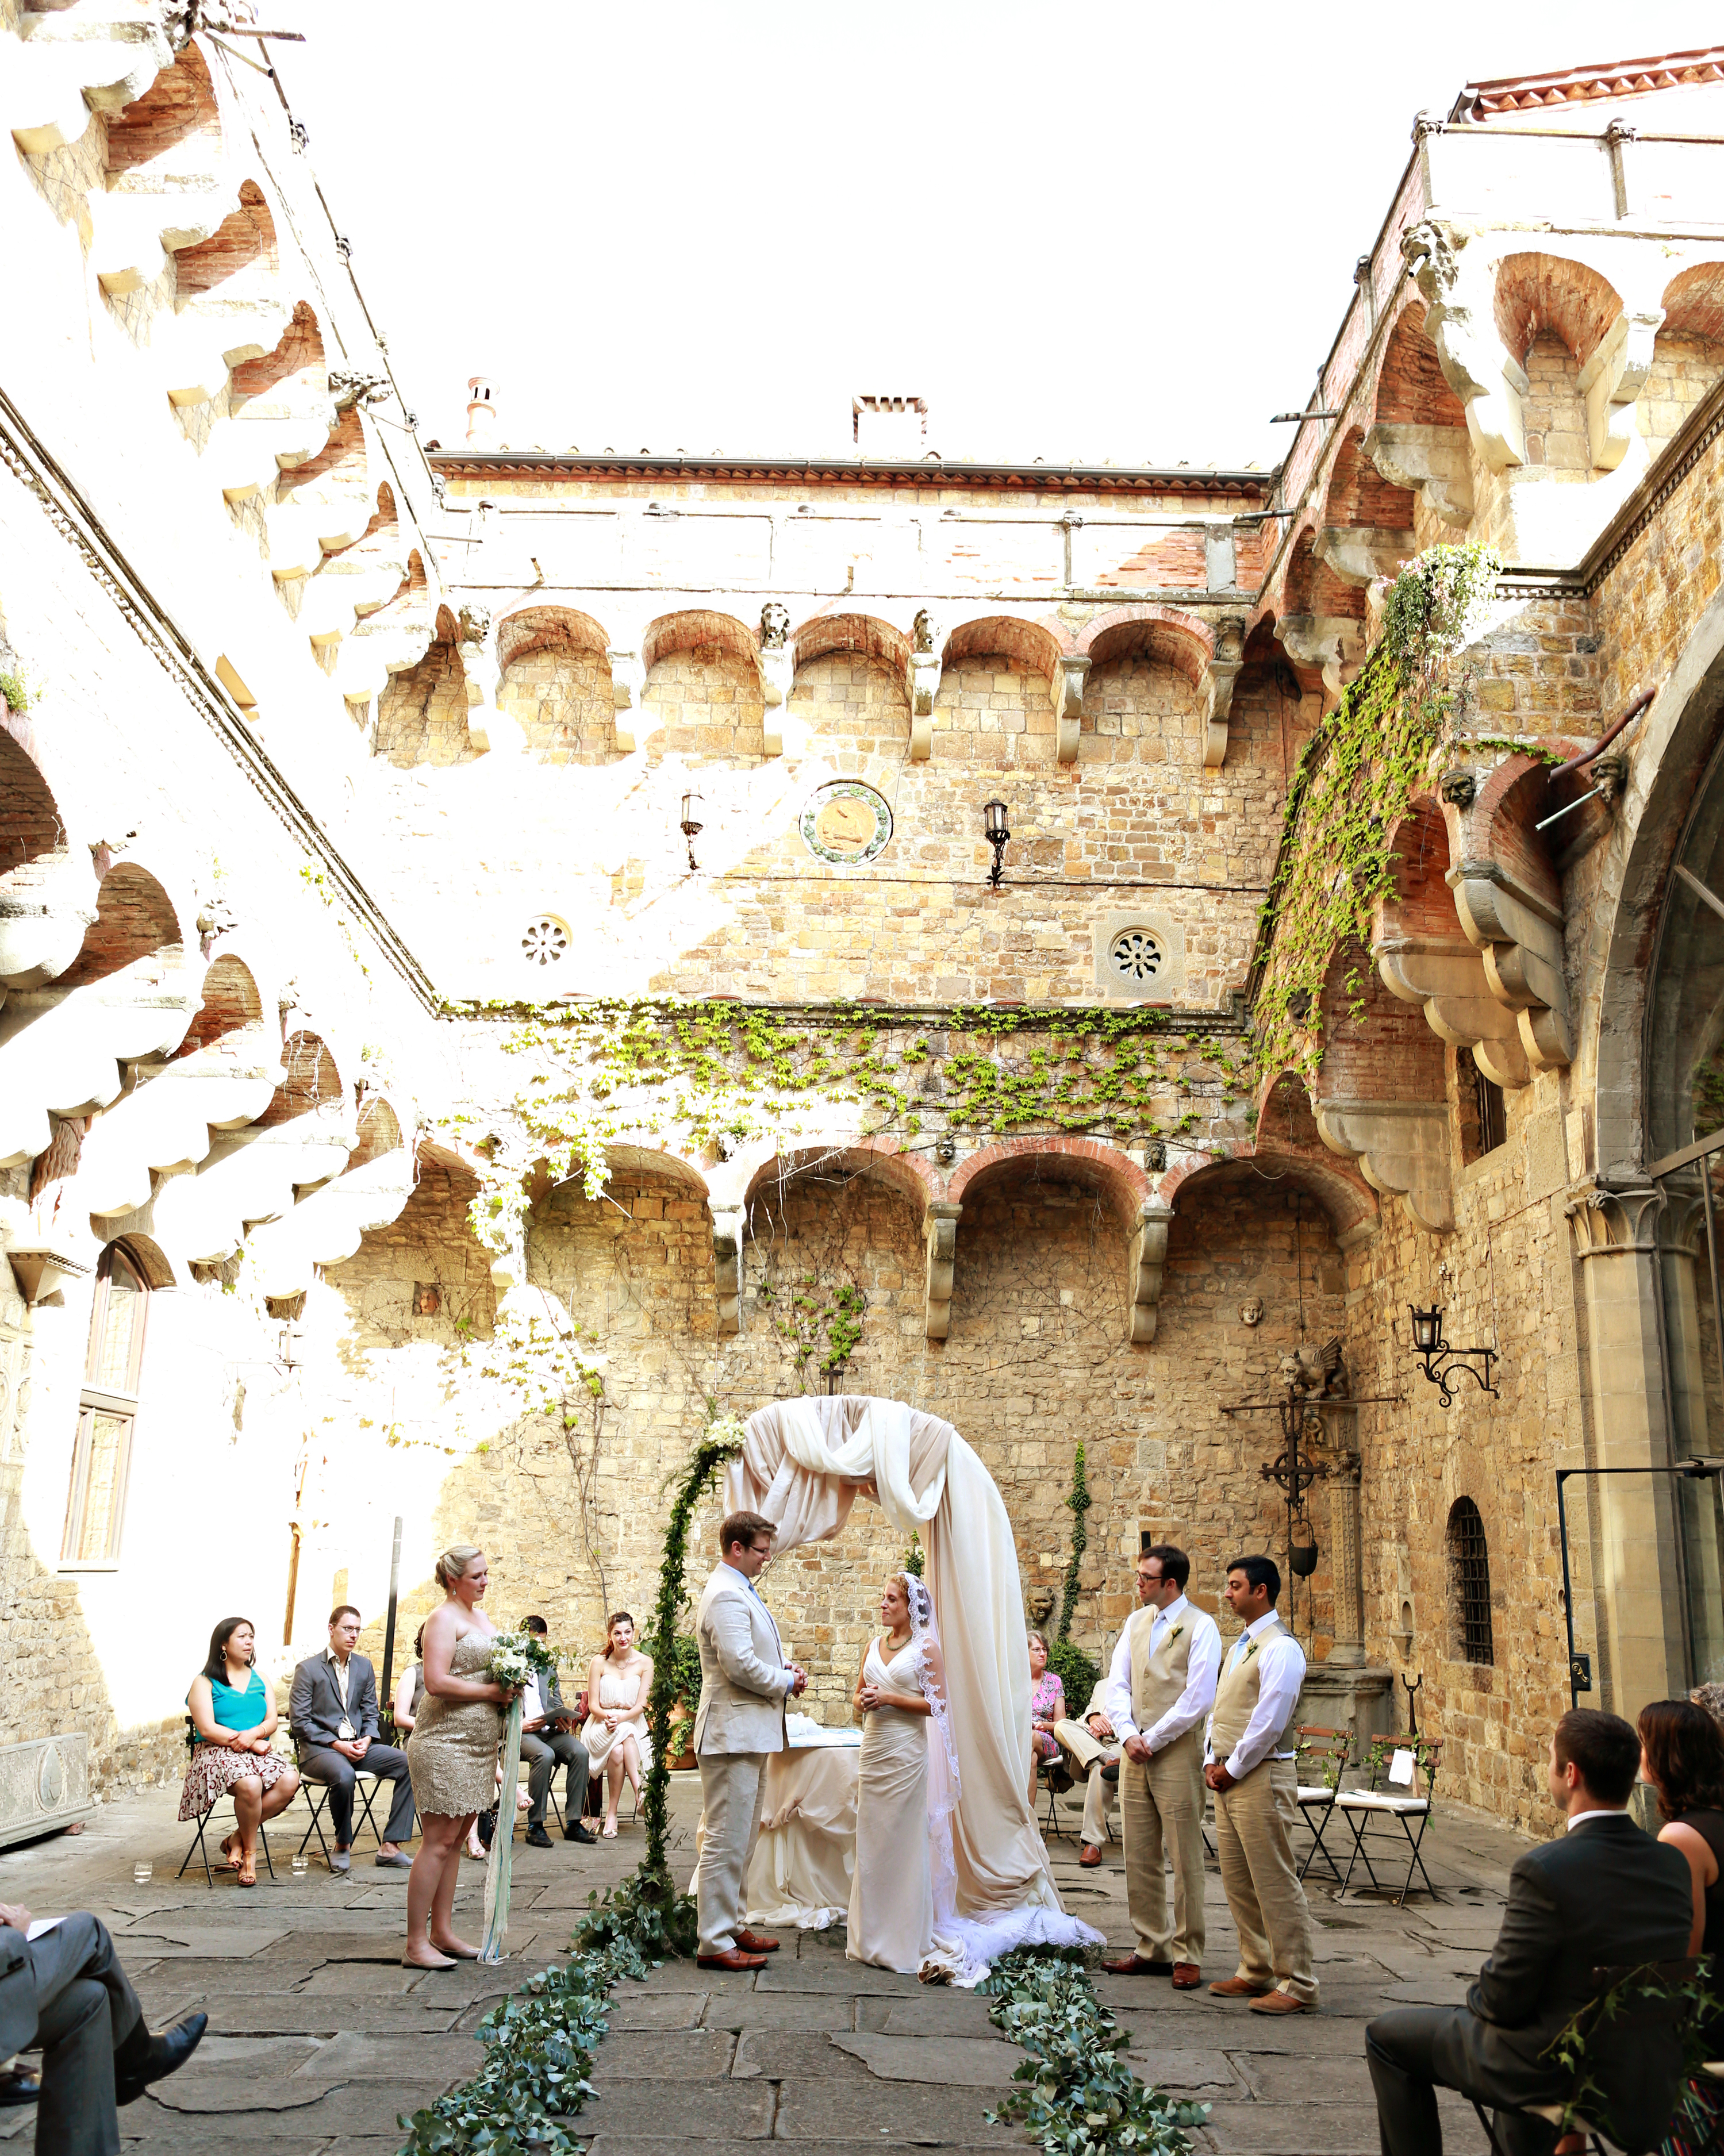 lindsay-andy-wedding-ceremony-4940-s111659-1114.jpg